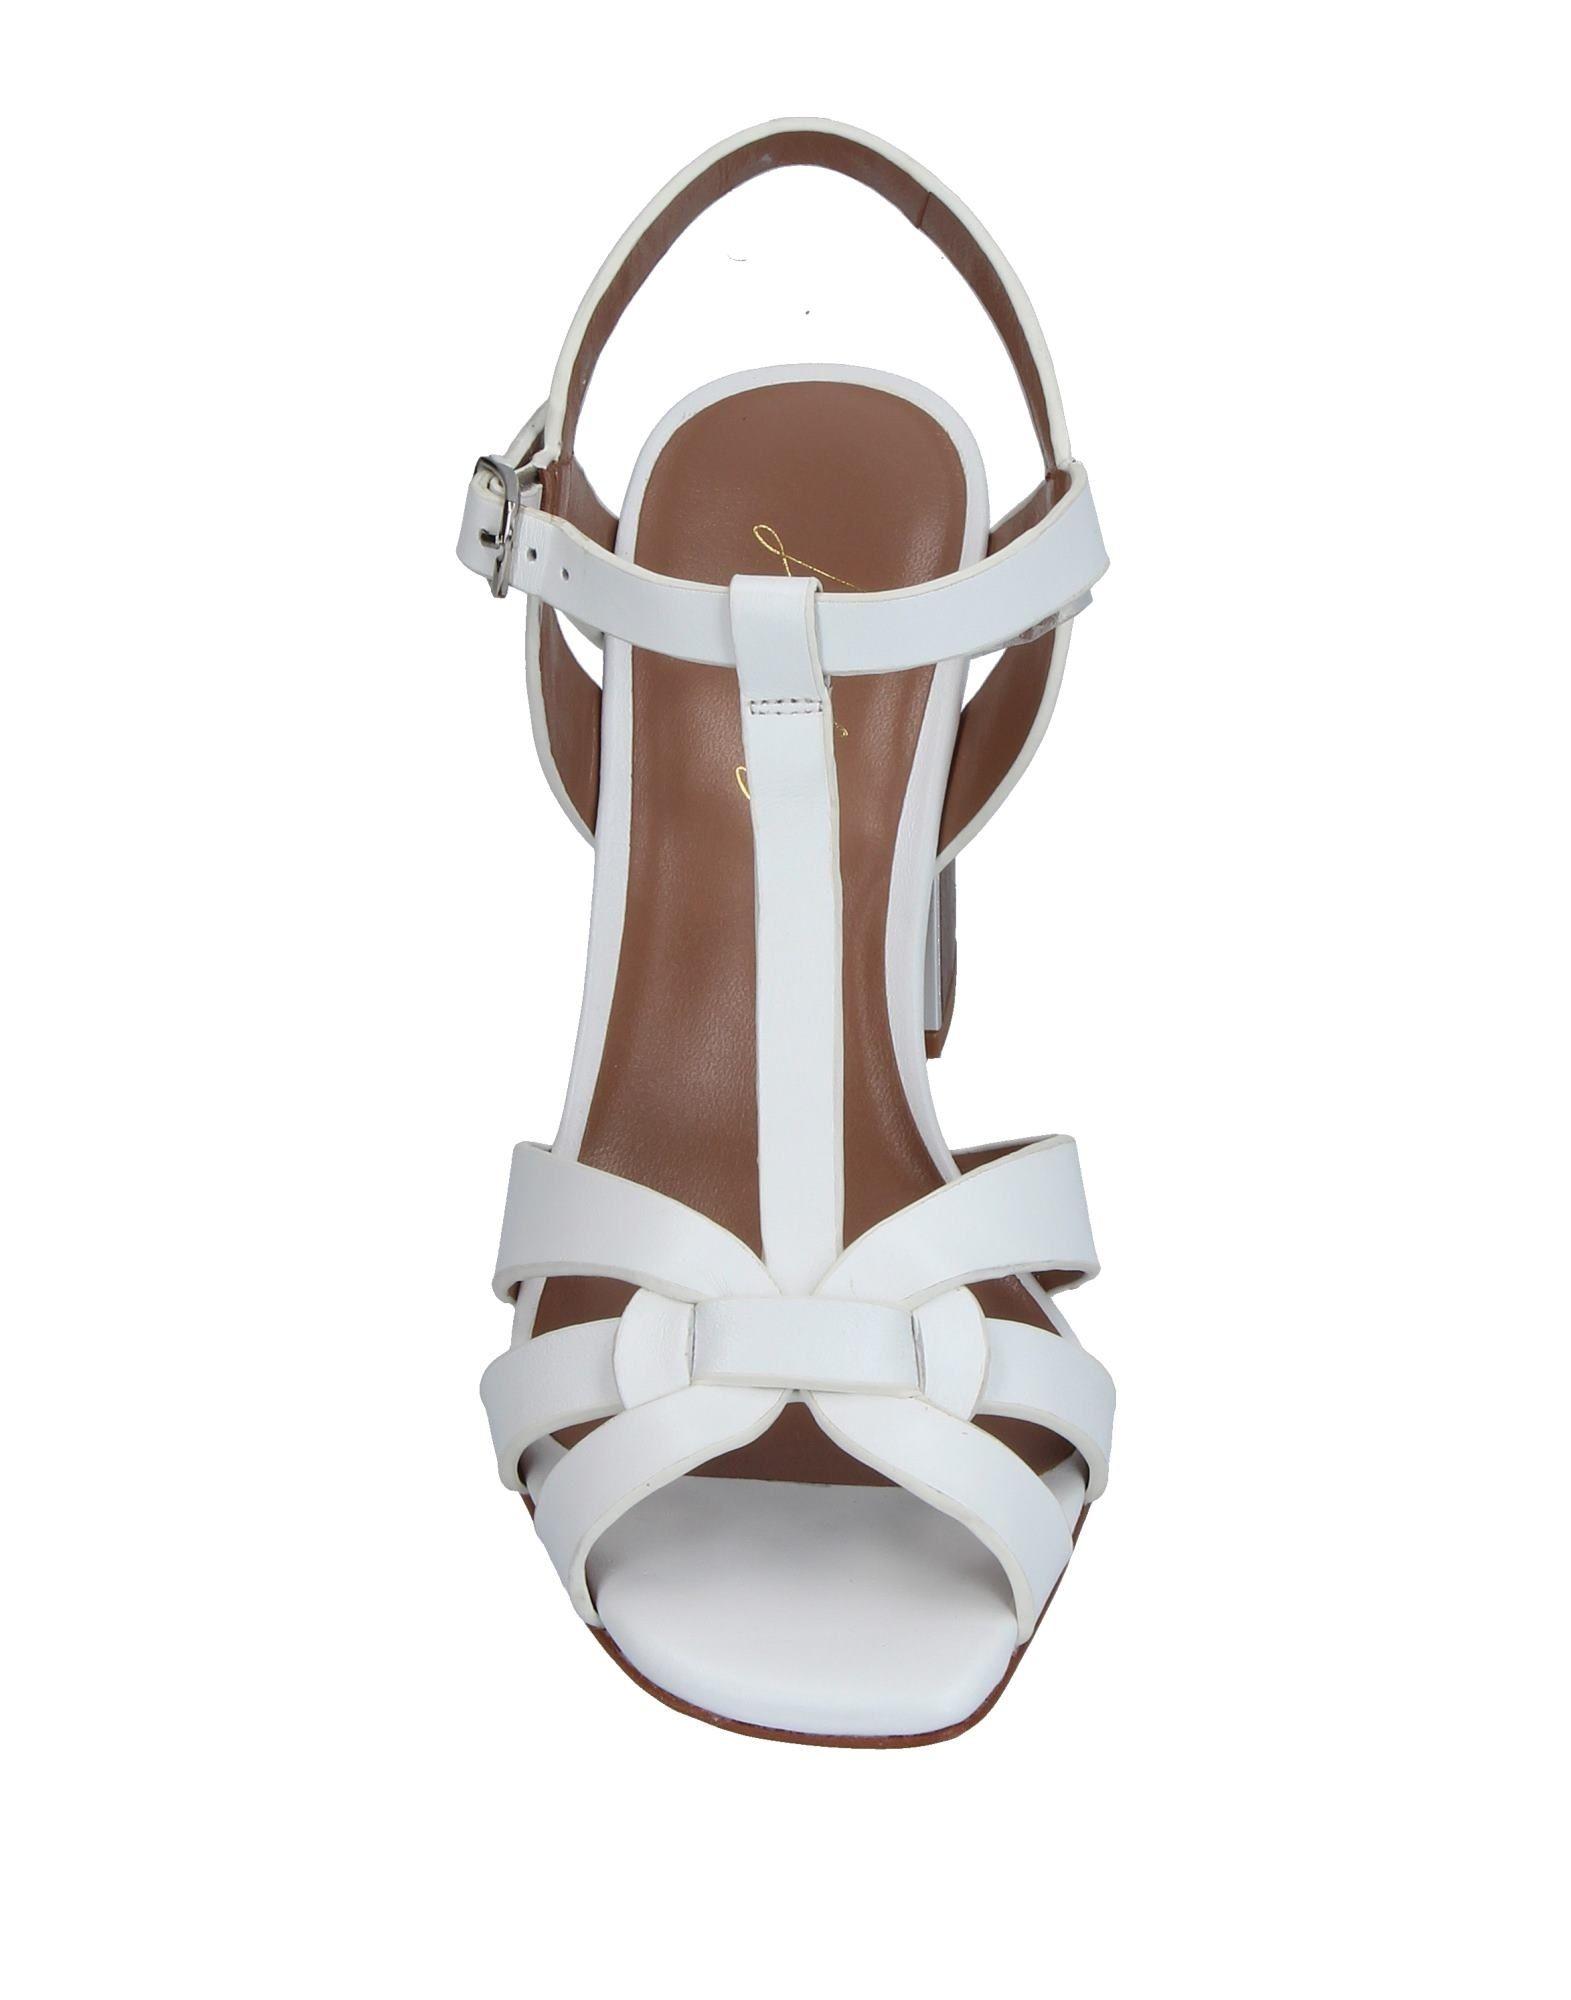 dc27fec1e39 ... Lola Cruz Sandals Sandals Sandals - Women Lola Cruz Sandals online on  Canada - 11345938QU 04e79c ...